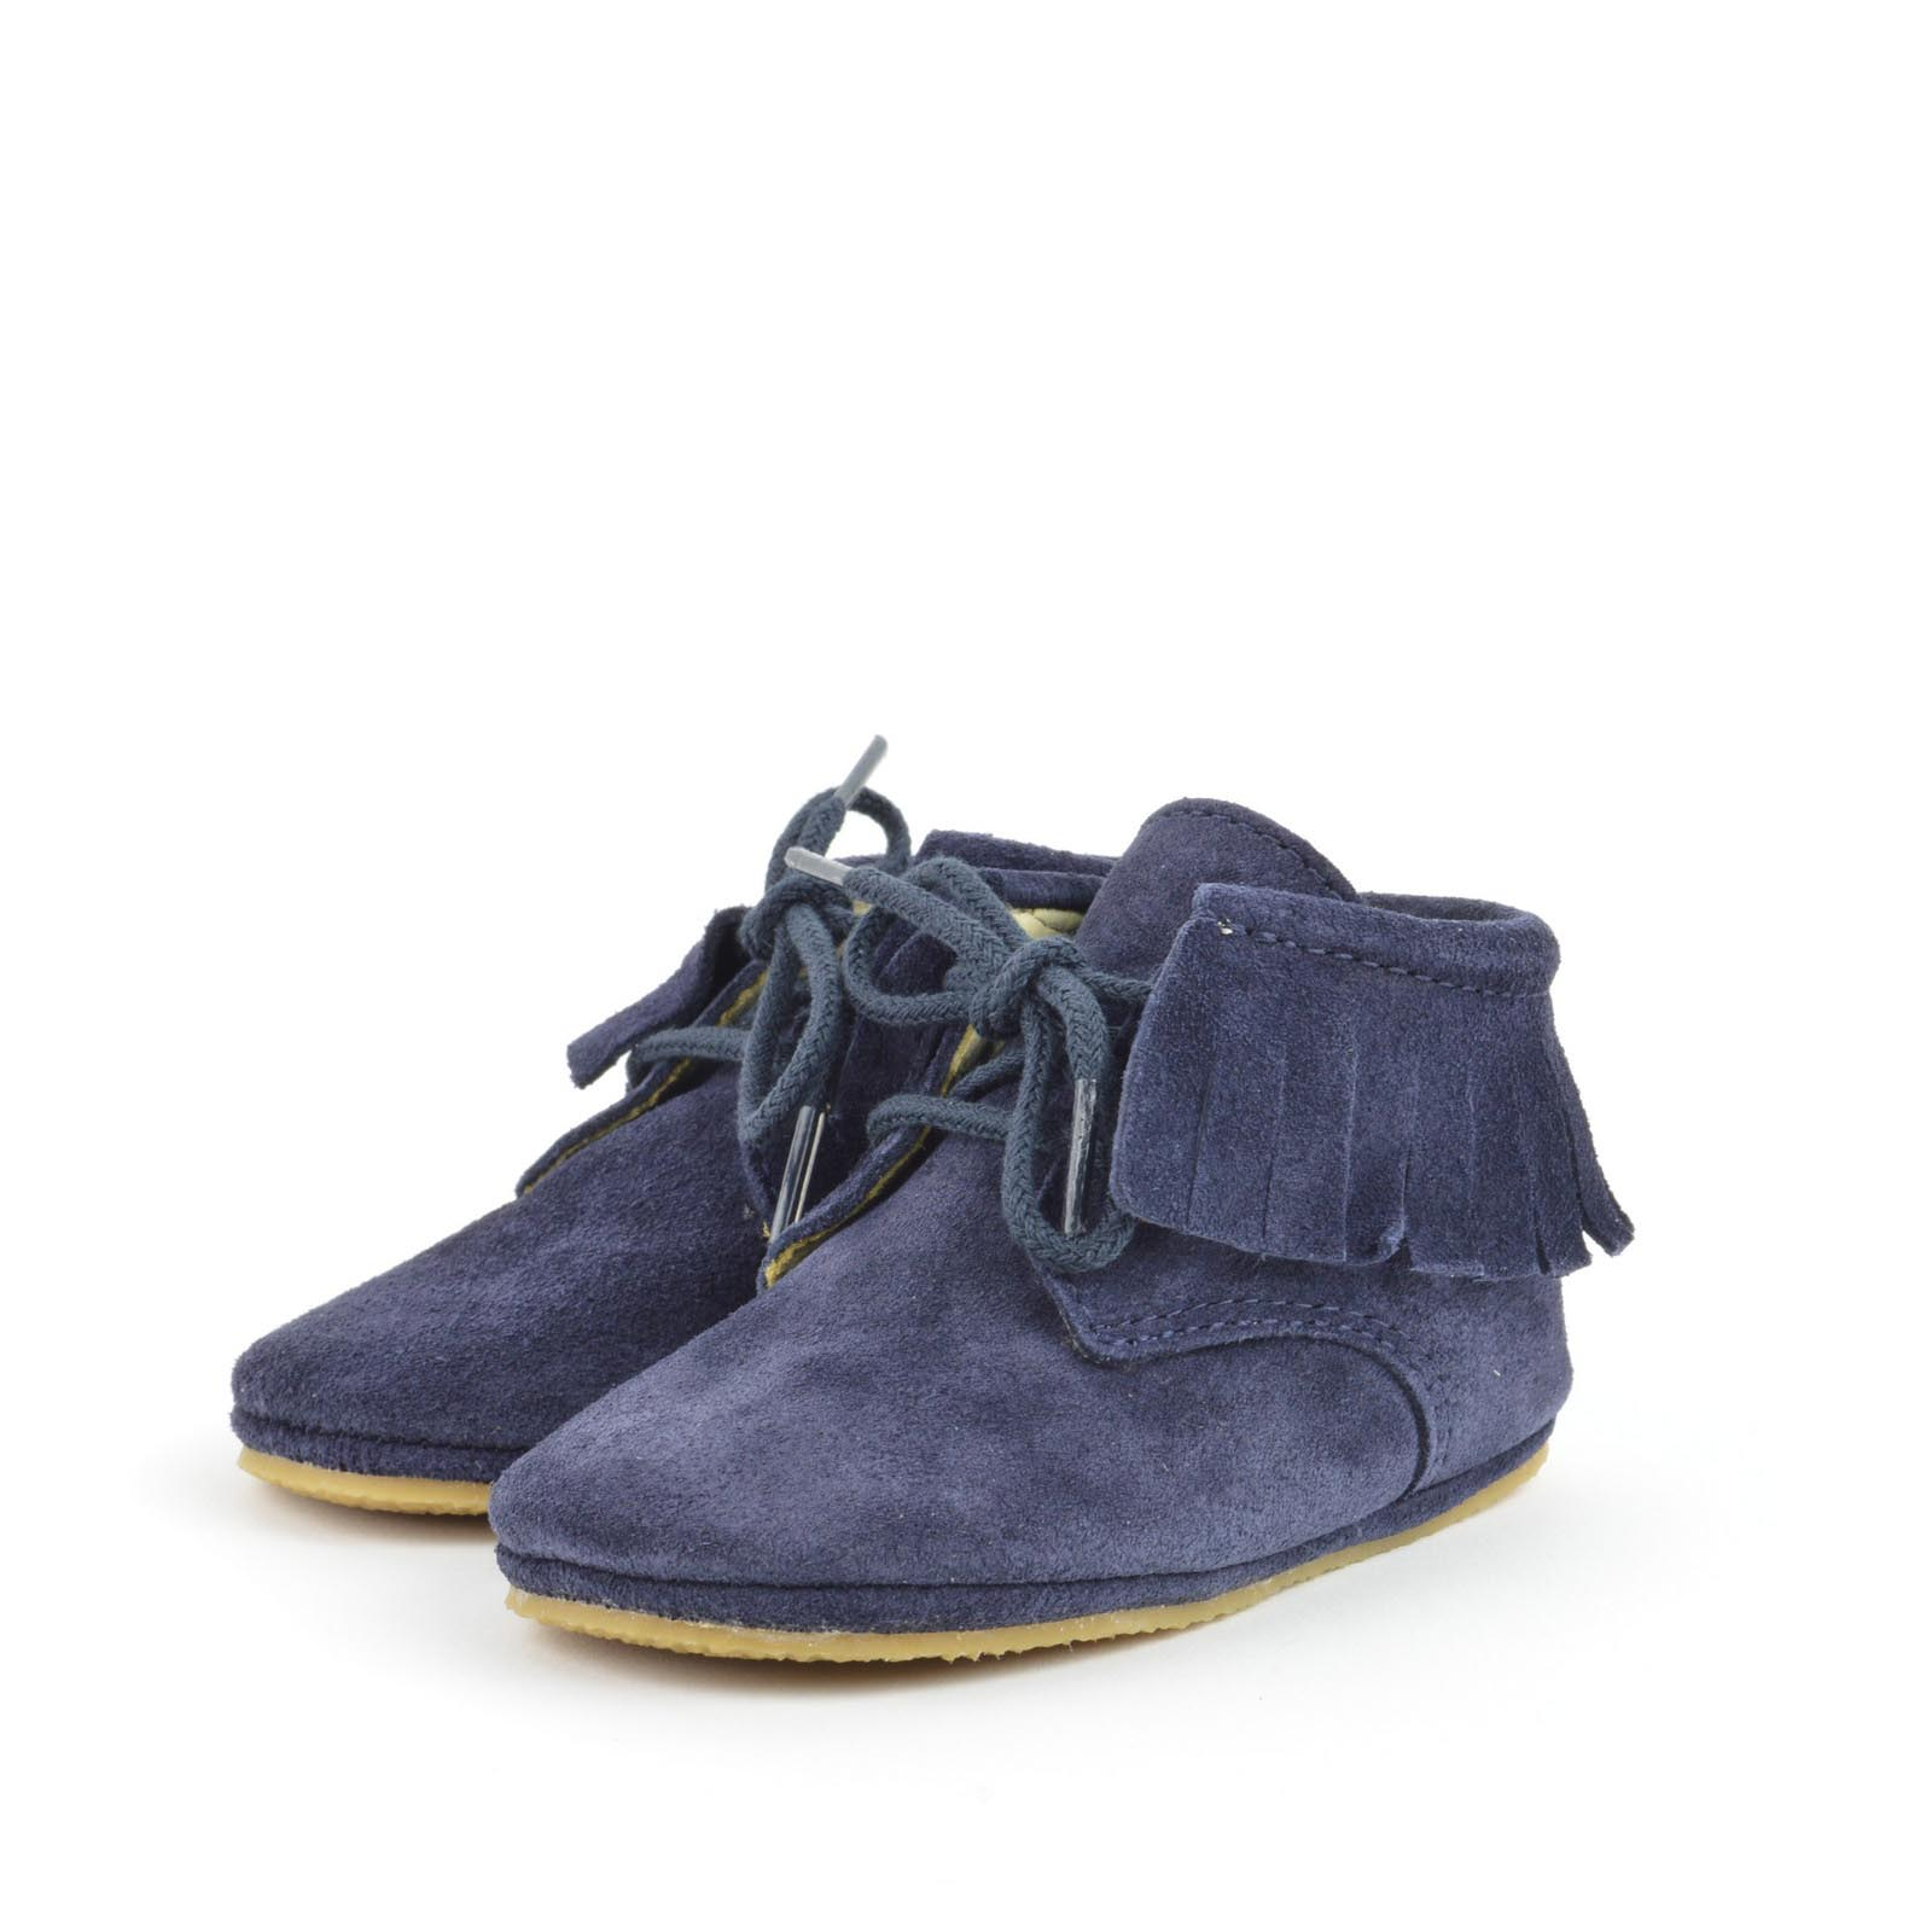 ea2b2c2a666 Pinocchio F1109 suede order online   Oxener Shoes